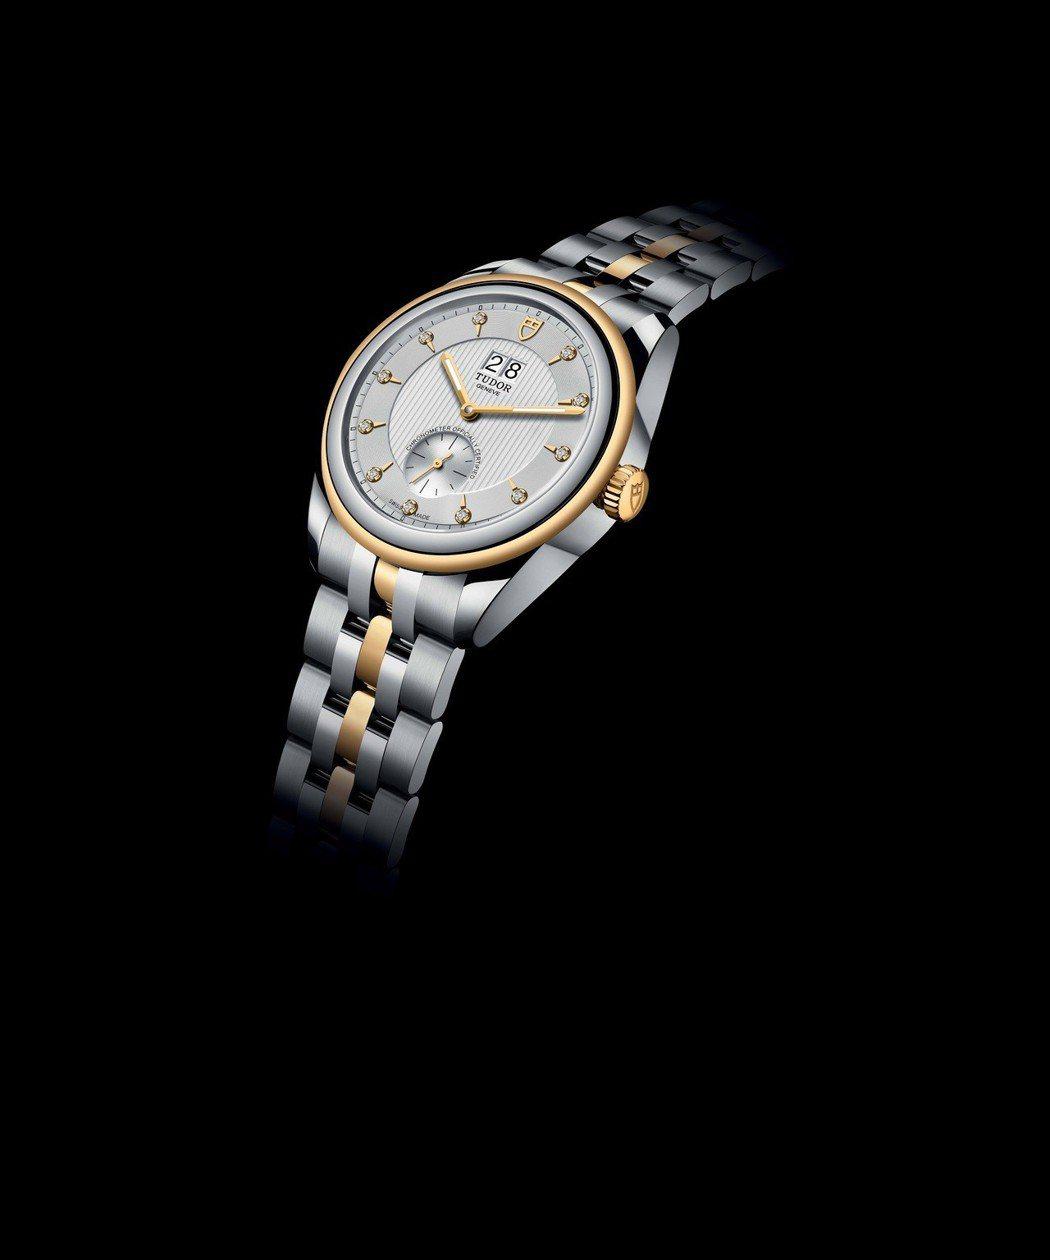 Tudor Glamour Double Date有著鑲鑽的銀配金錶面及黃金鋼錶...